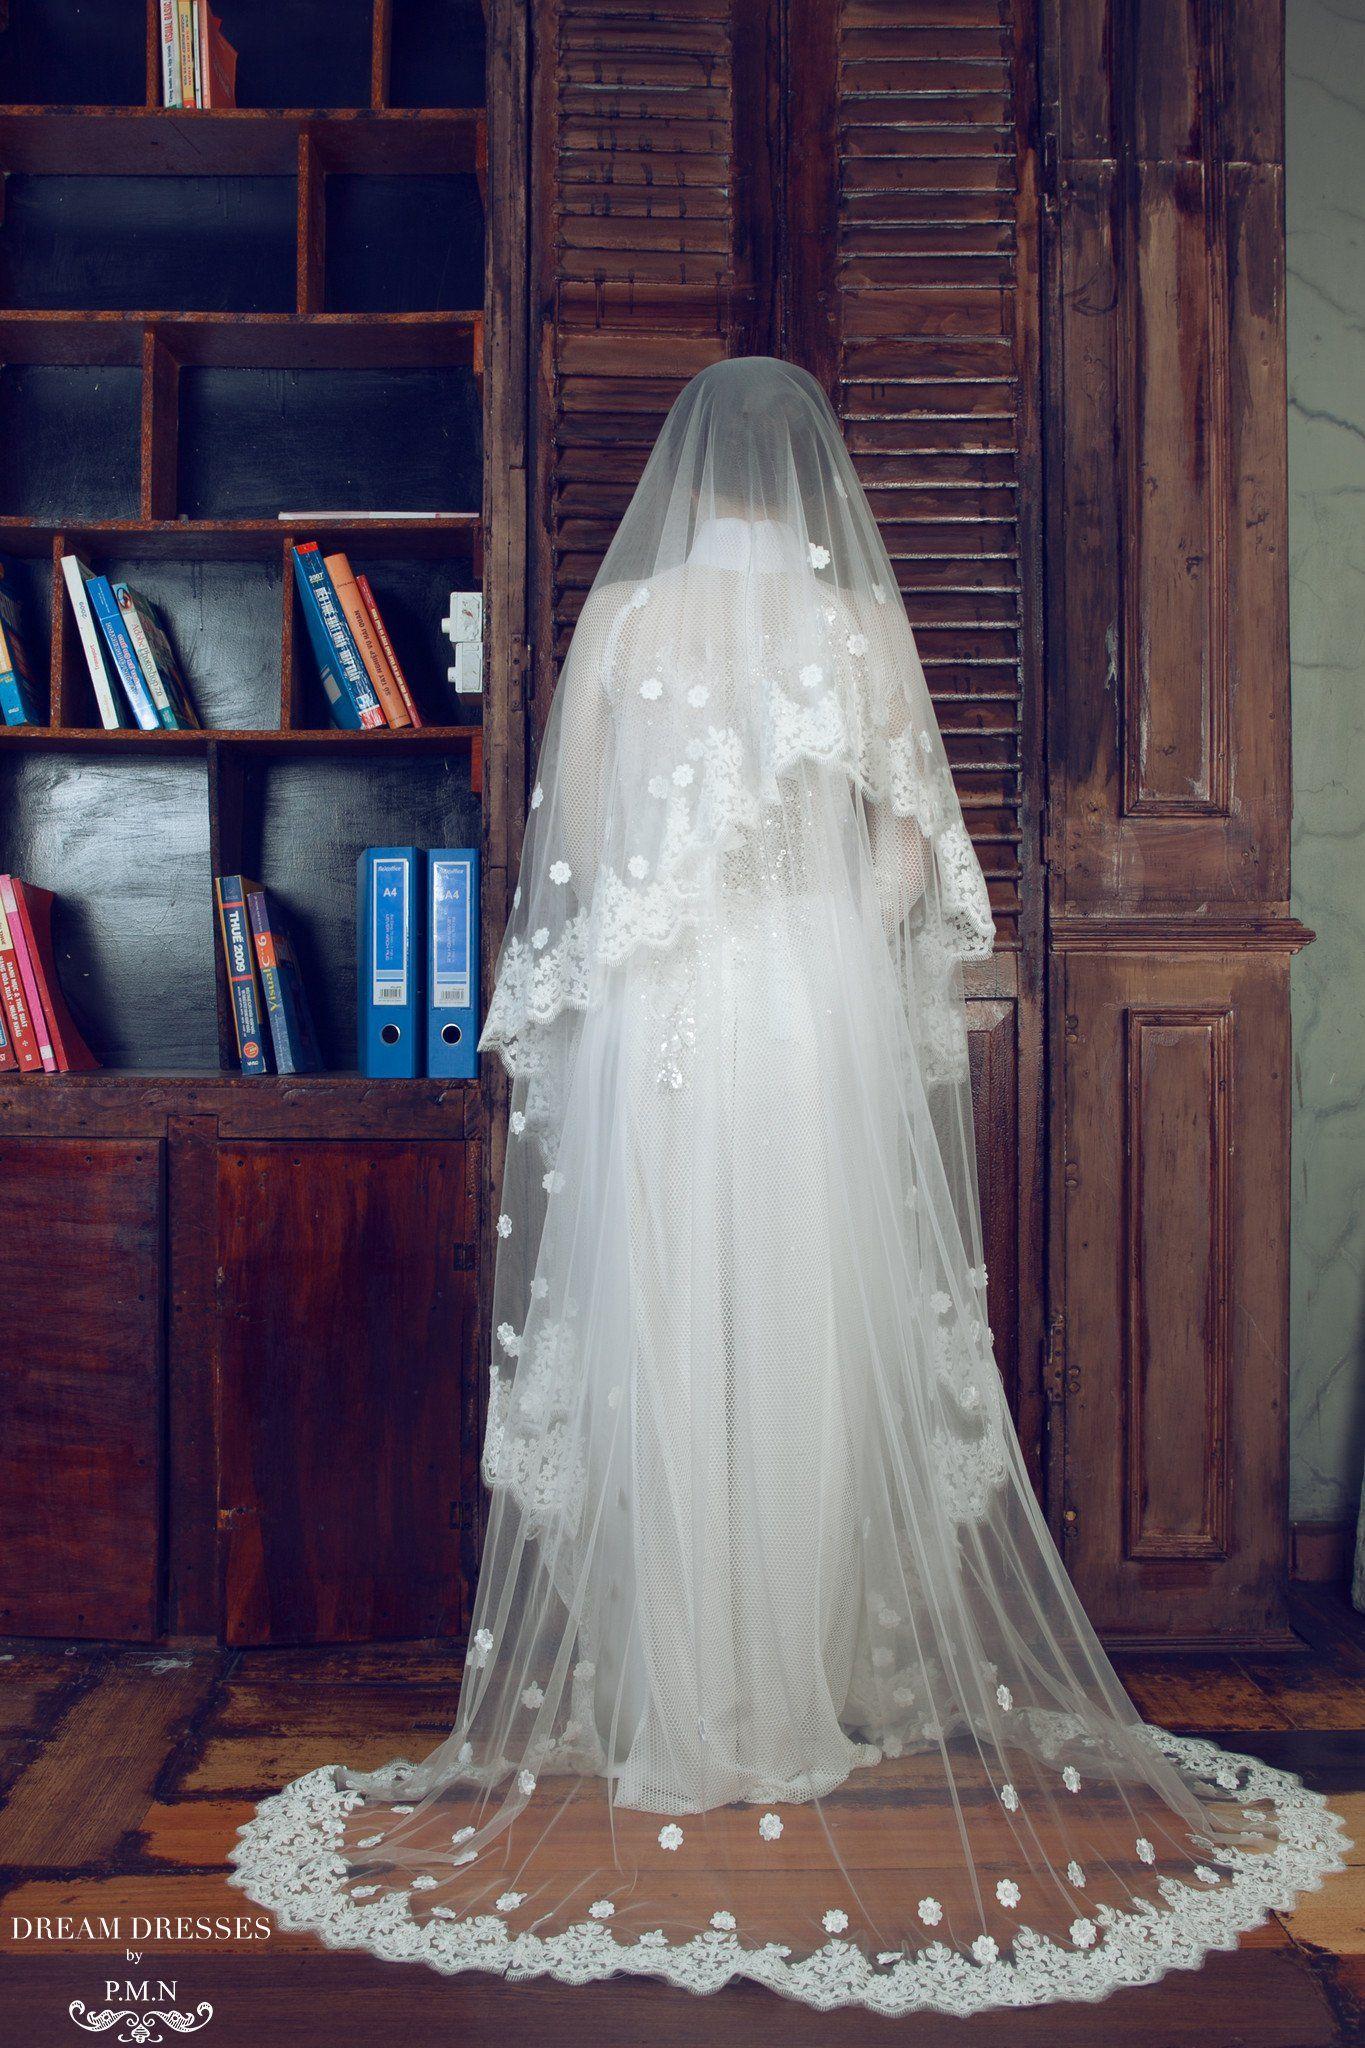 2019 year look- Vietnamese traditional wedding dress